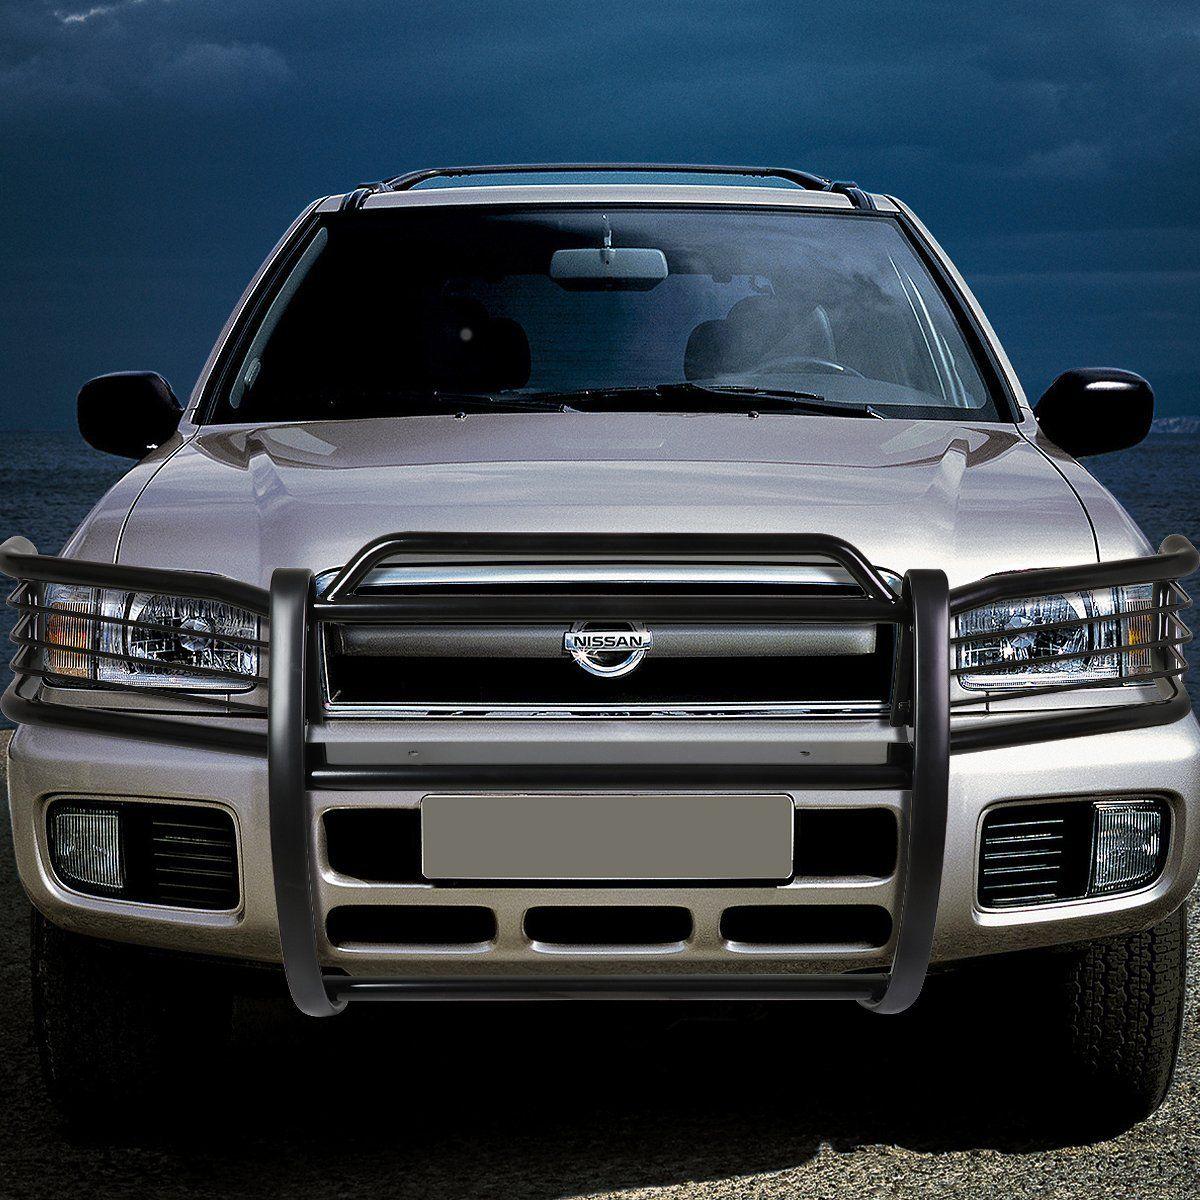 96 04 Nissan Pathfinder R50 Front Bumper Protector Brush Grille Guard Black Vehiculos Todoterreno Camionetas 4x4 Autos